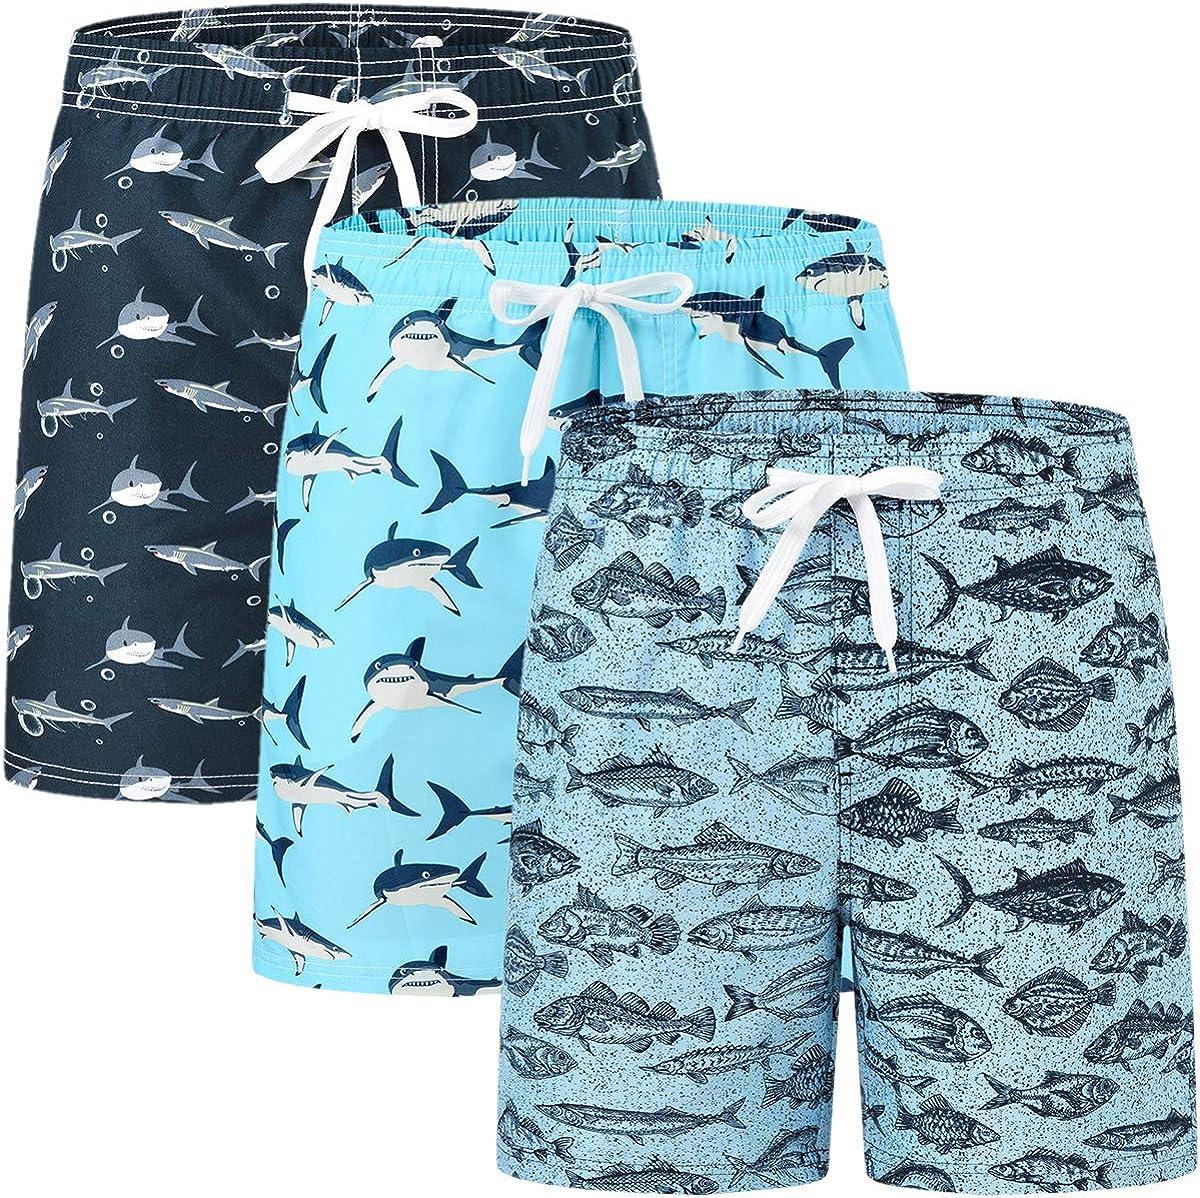 MoFiz Boys Swim Trunks Swimsuit Quick Dry Bathing Suit Swimwear Shorts 2 Pack